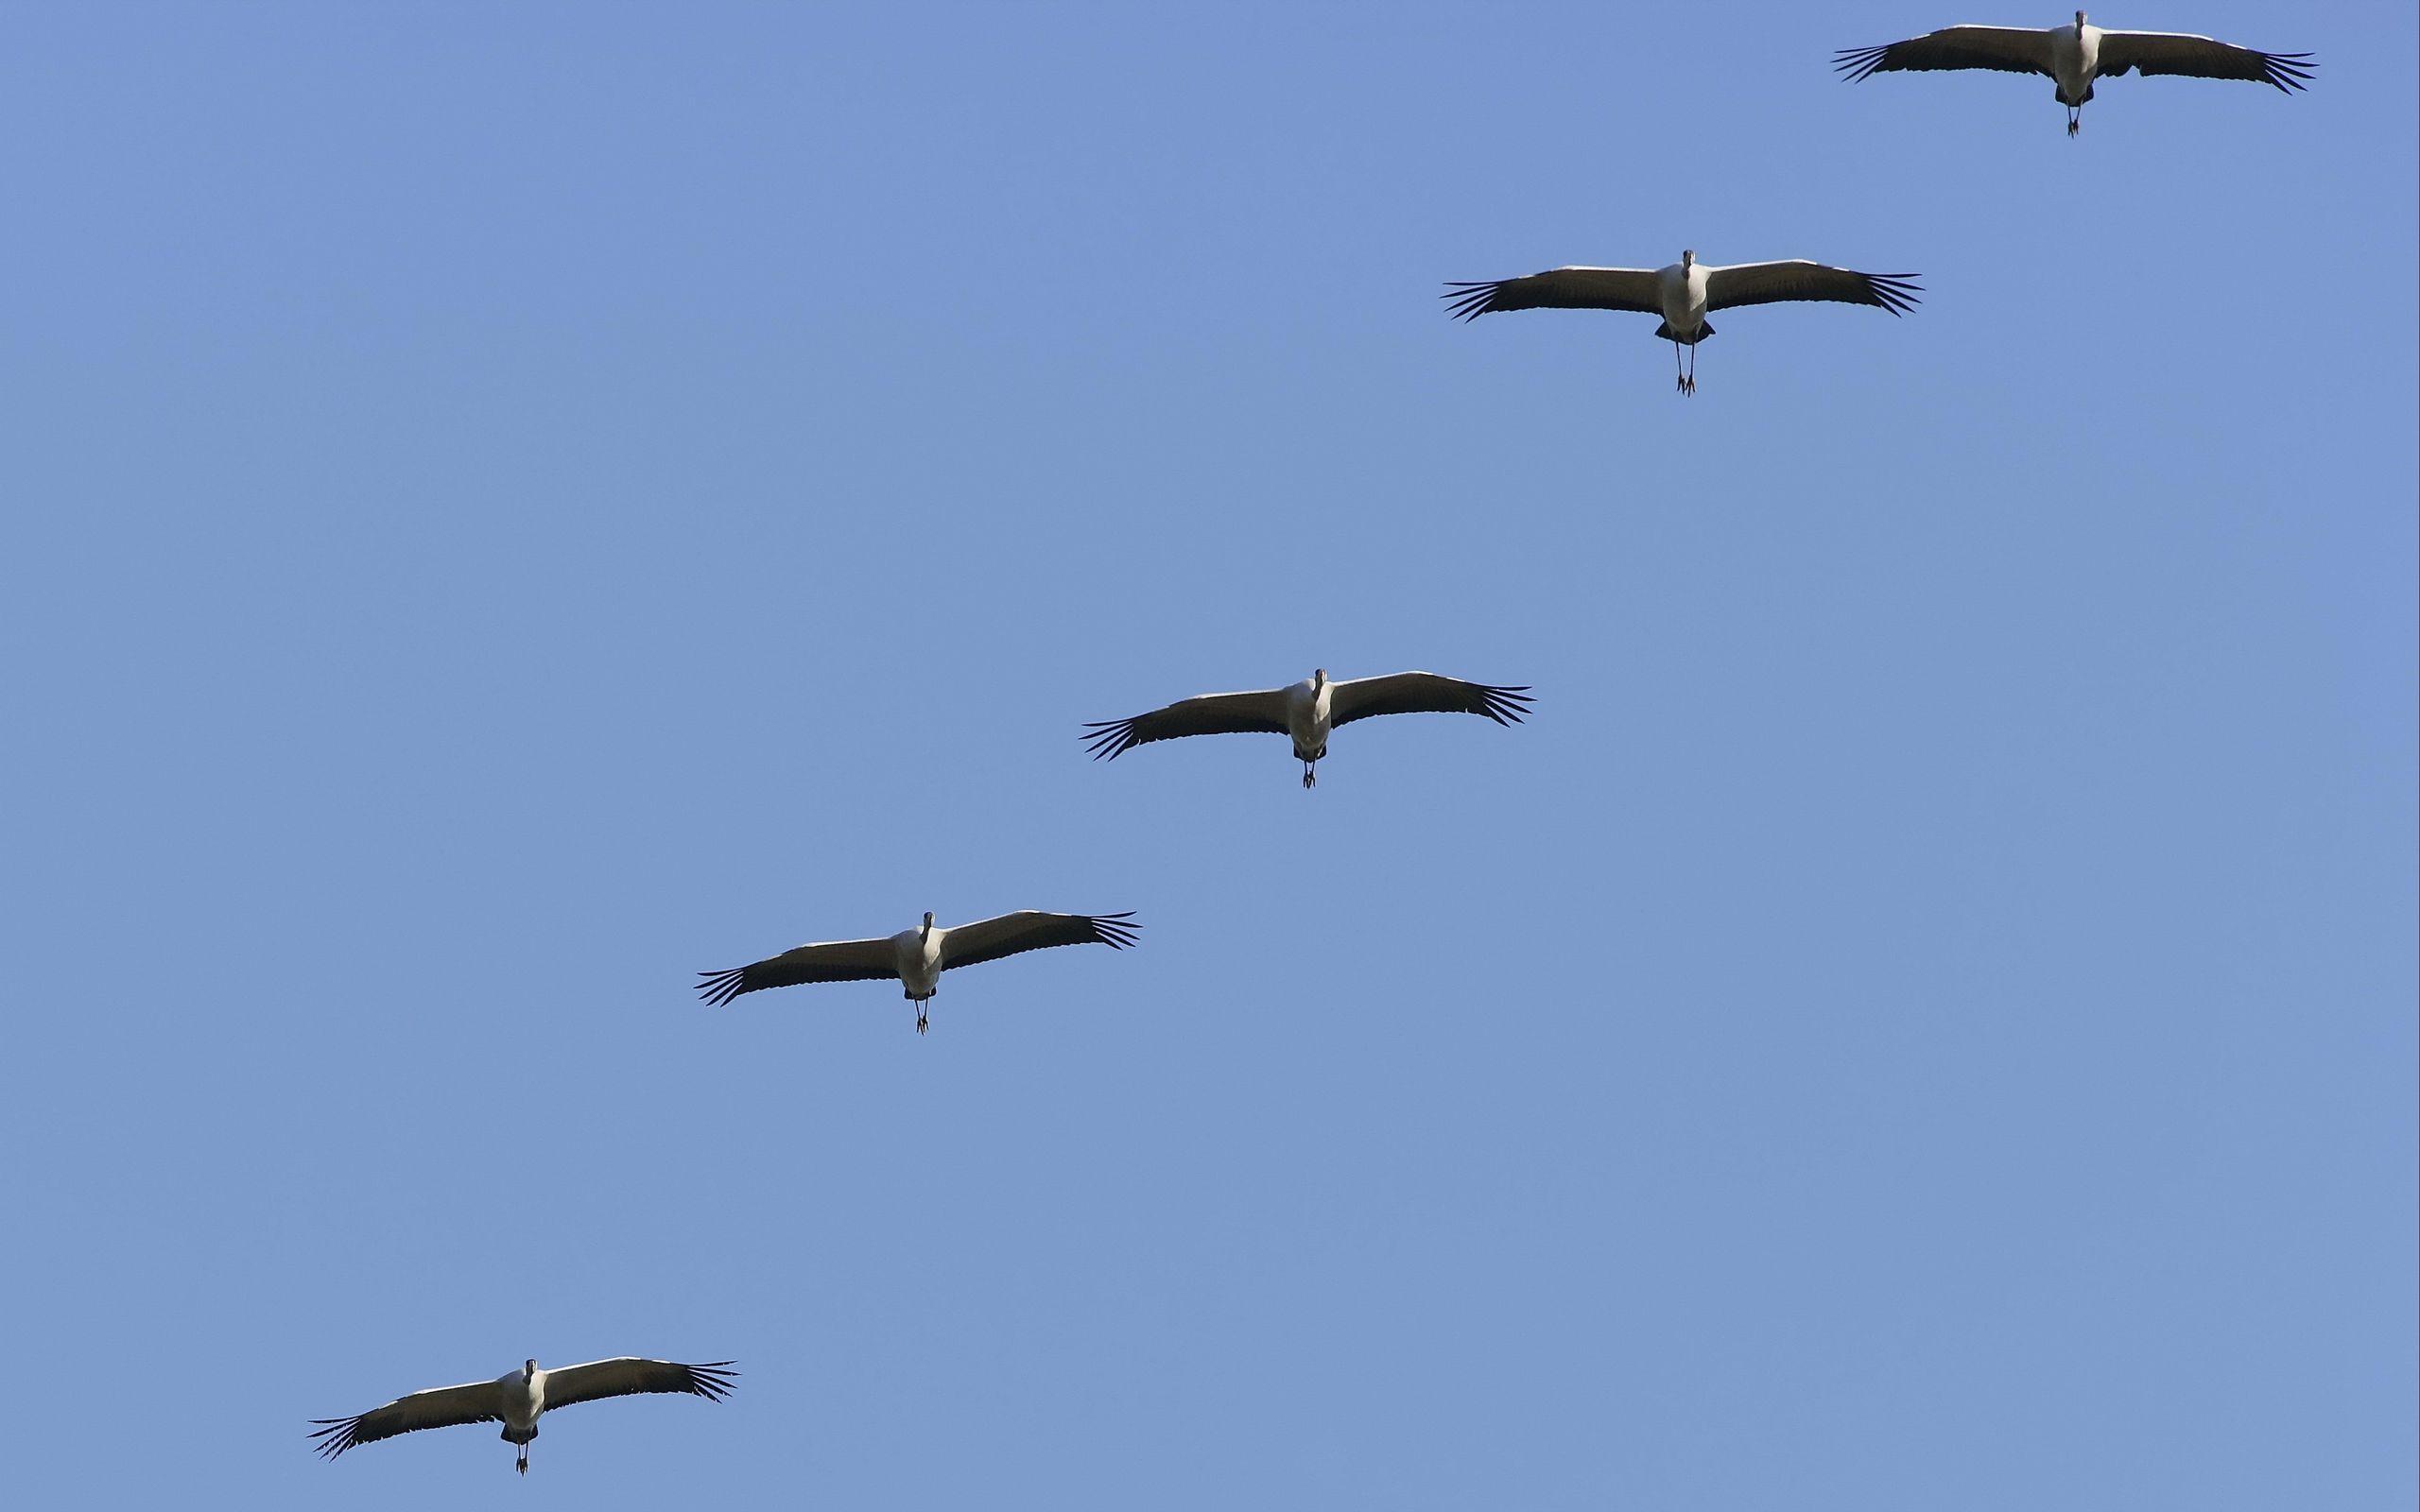 2560x1600 Wallpaper crane, flock, sky